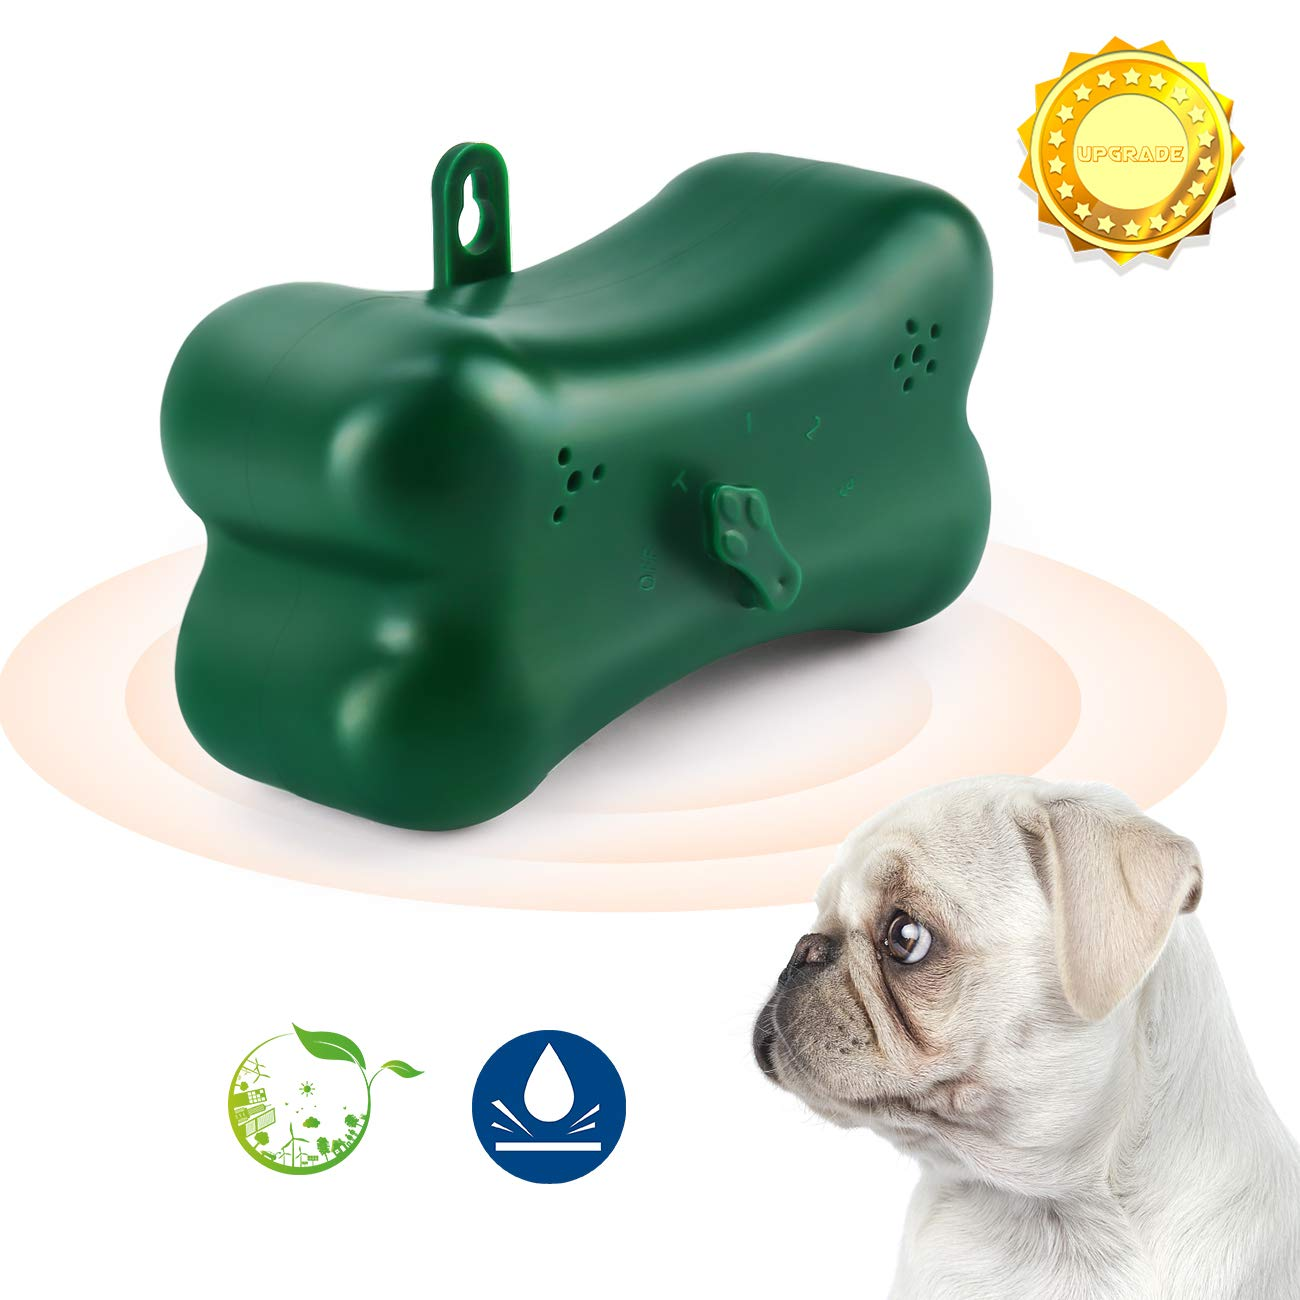 Bark Control Device, Zomma Mini Bark Control Device Indoor/Outdoor Anti Barking Ultrasonic Dog Bark Control Sonic Bark Deterrents Silencer Stop Barking, Dog Bark Control (UPGRADED) by Zomma